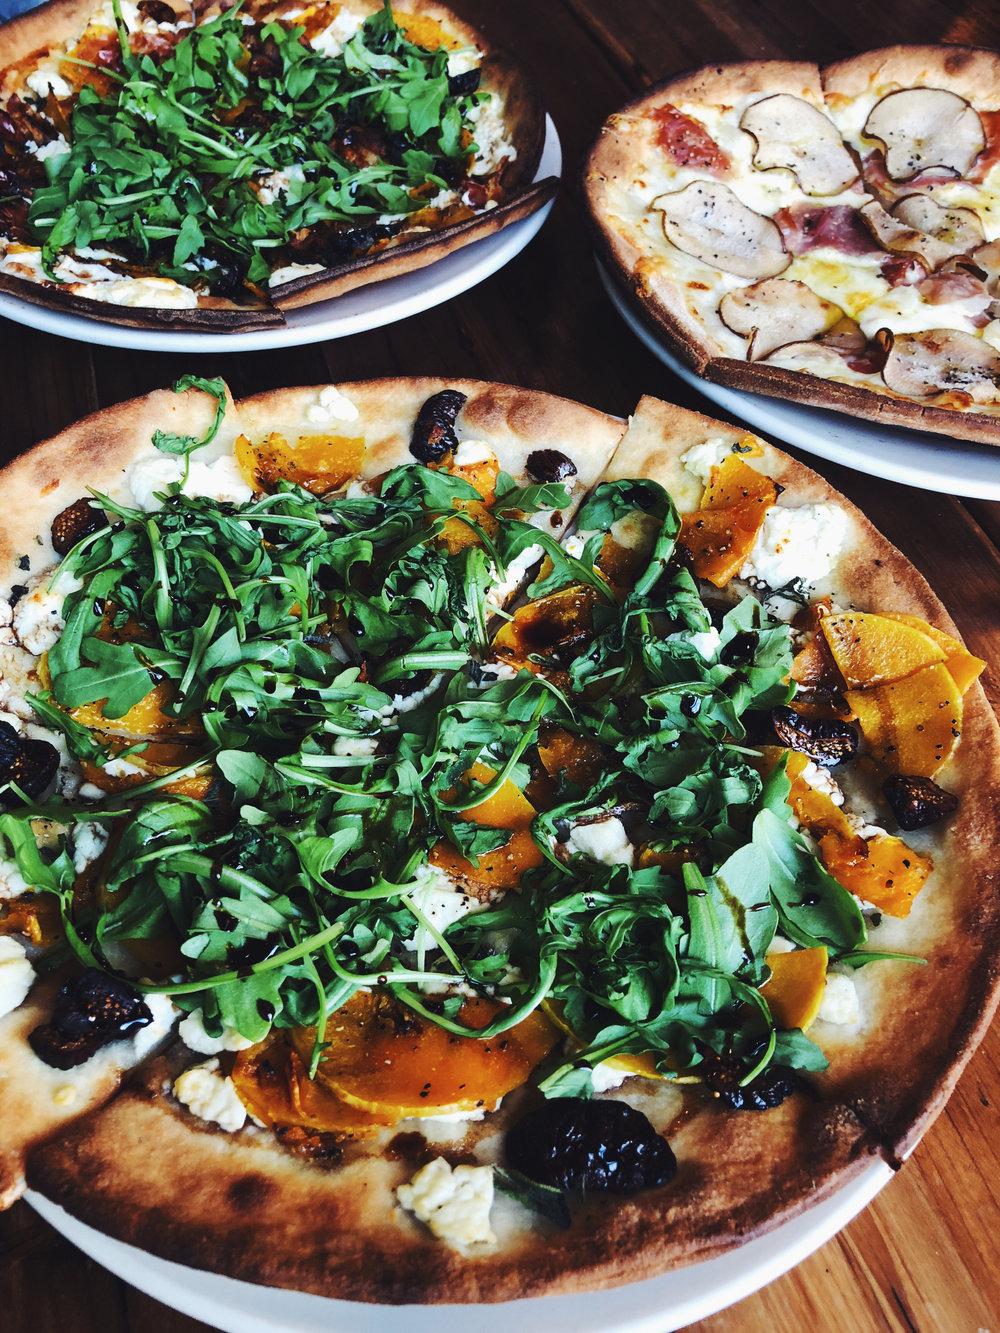 KATIE'S PIZZA &PASTA